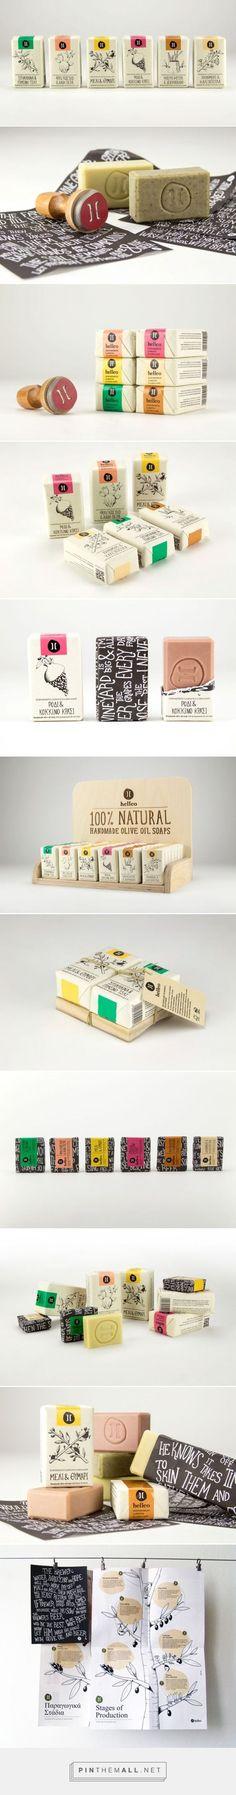 Helleo Natural Soap Packaging by till noon | Fivestar Branding – Design and Branding Agency & Inspiration Gallery